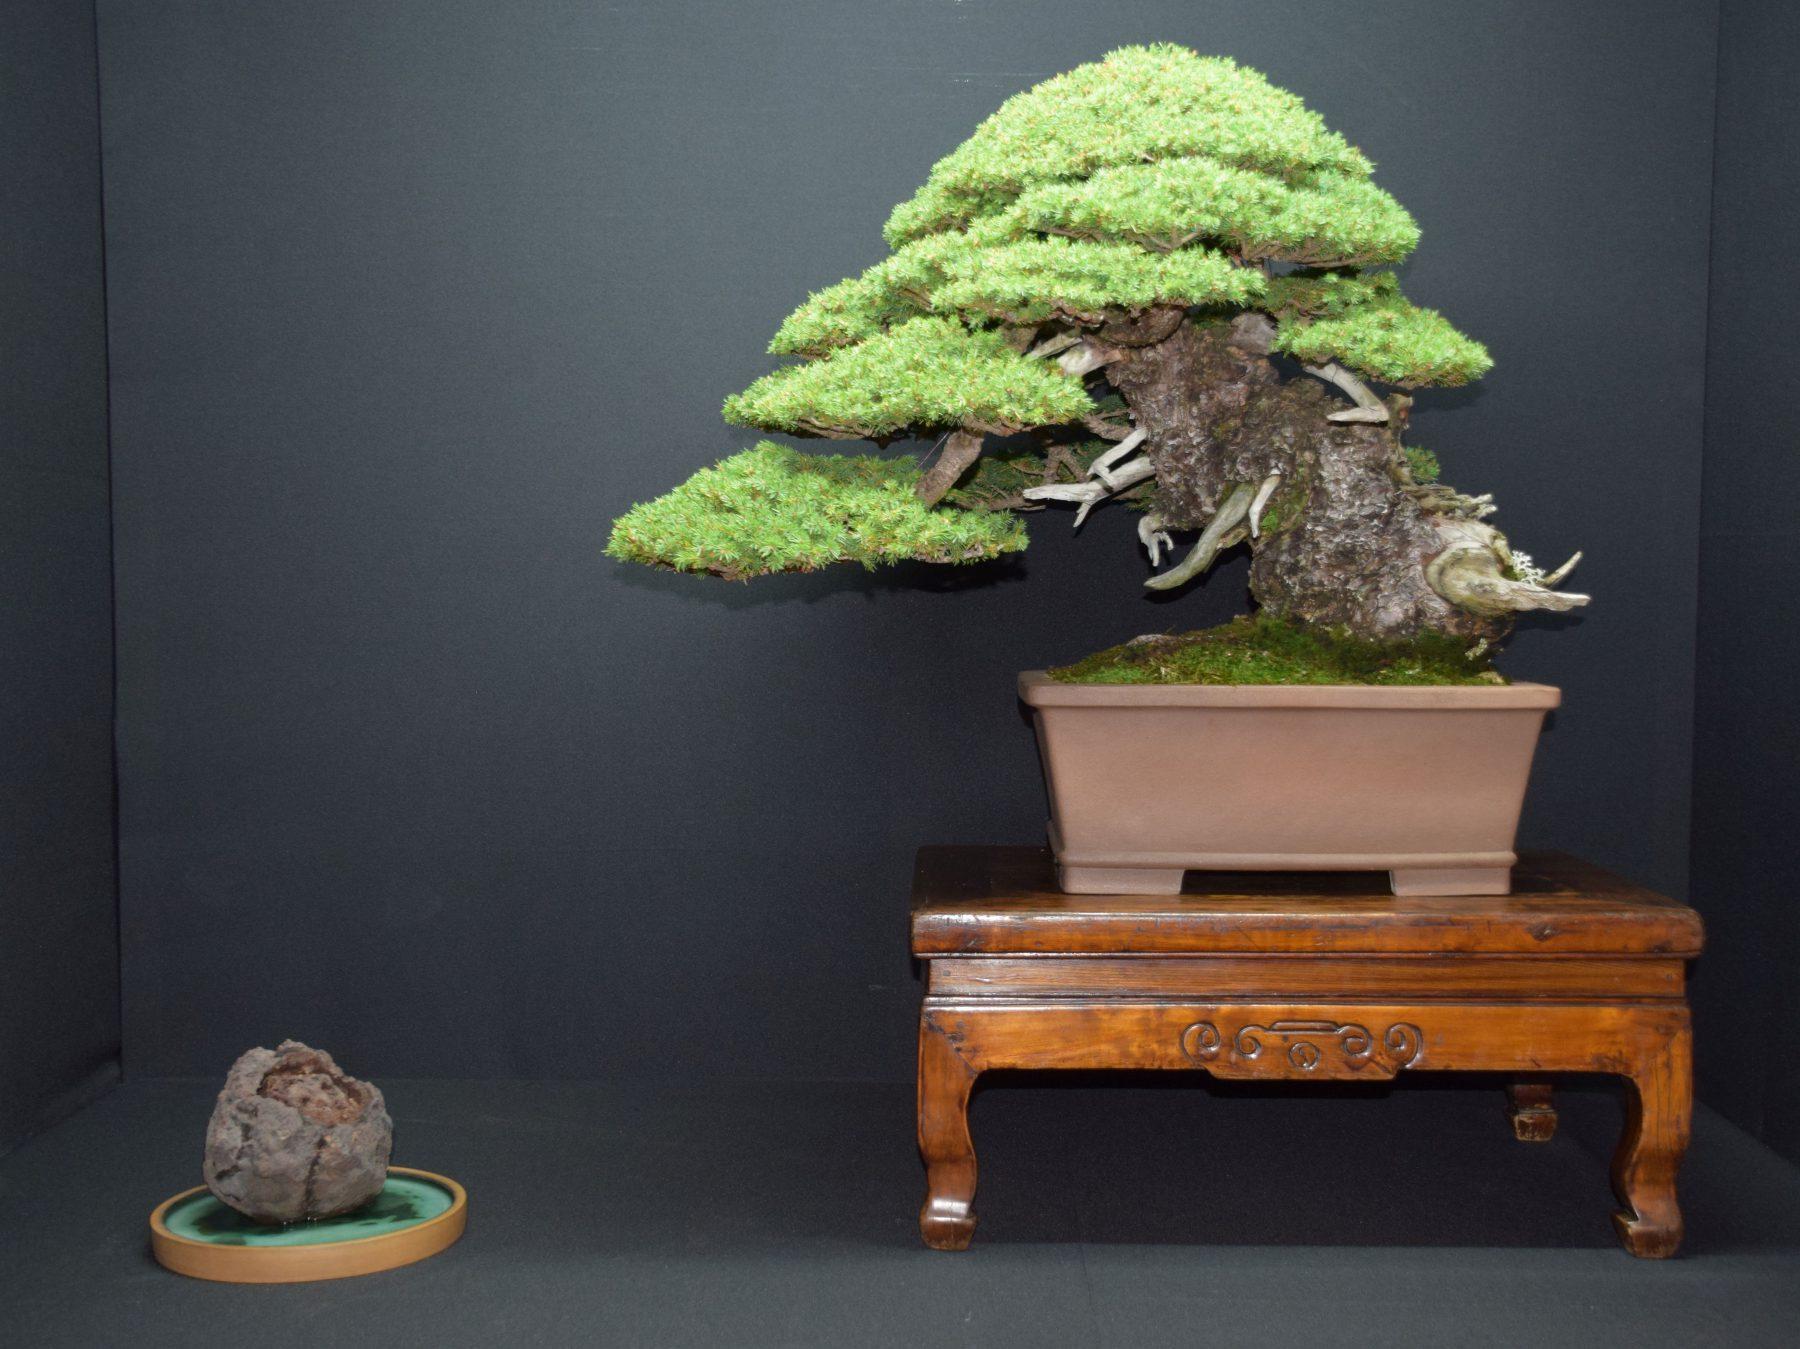 bonsai-museum-luis-vallejo-004